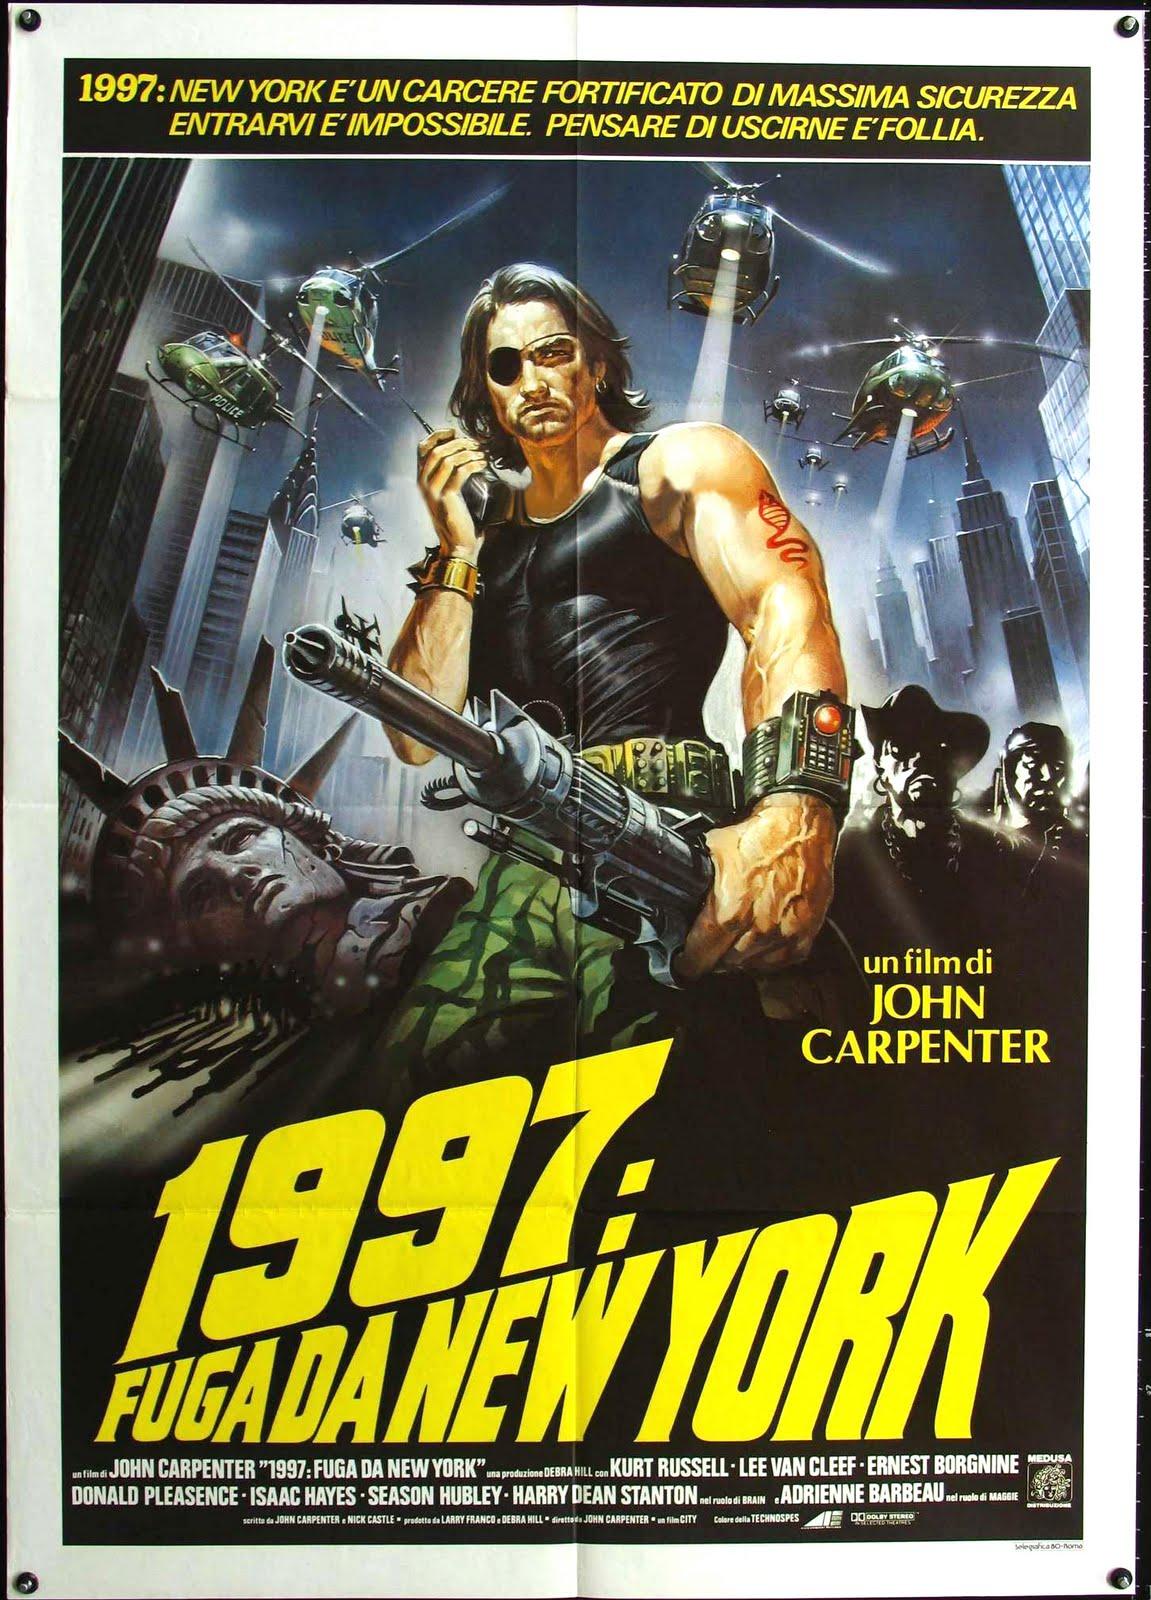 """1997: Fuga da New York"""